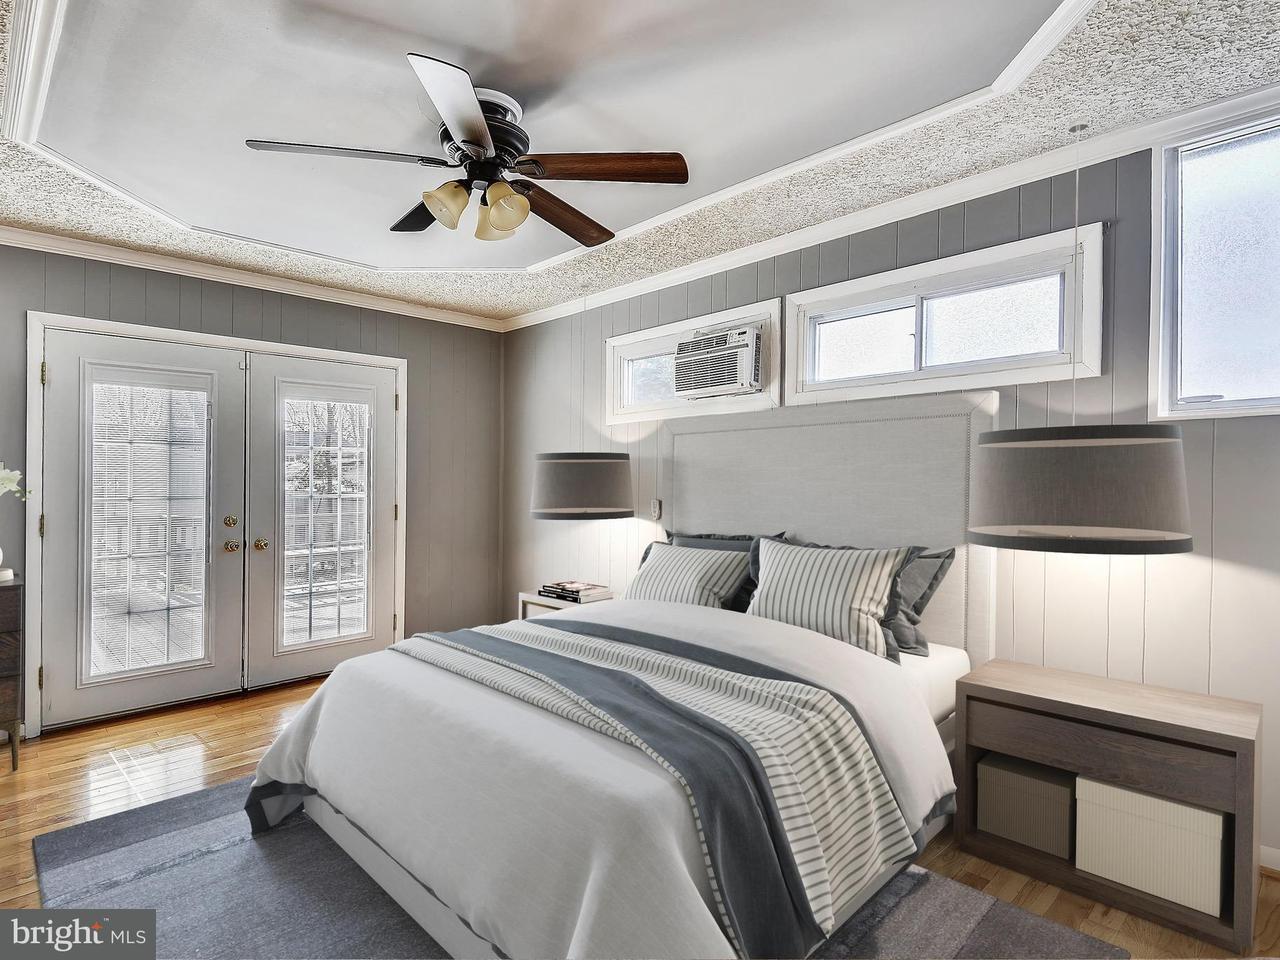 Additional photo for property listing at 10911 Warwick Avenue 10911 Warwick Avenue Fairfax, Виргиния 22030 Соединенные Штаты